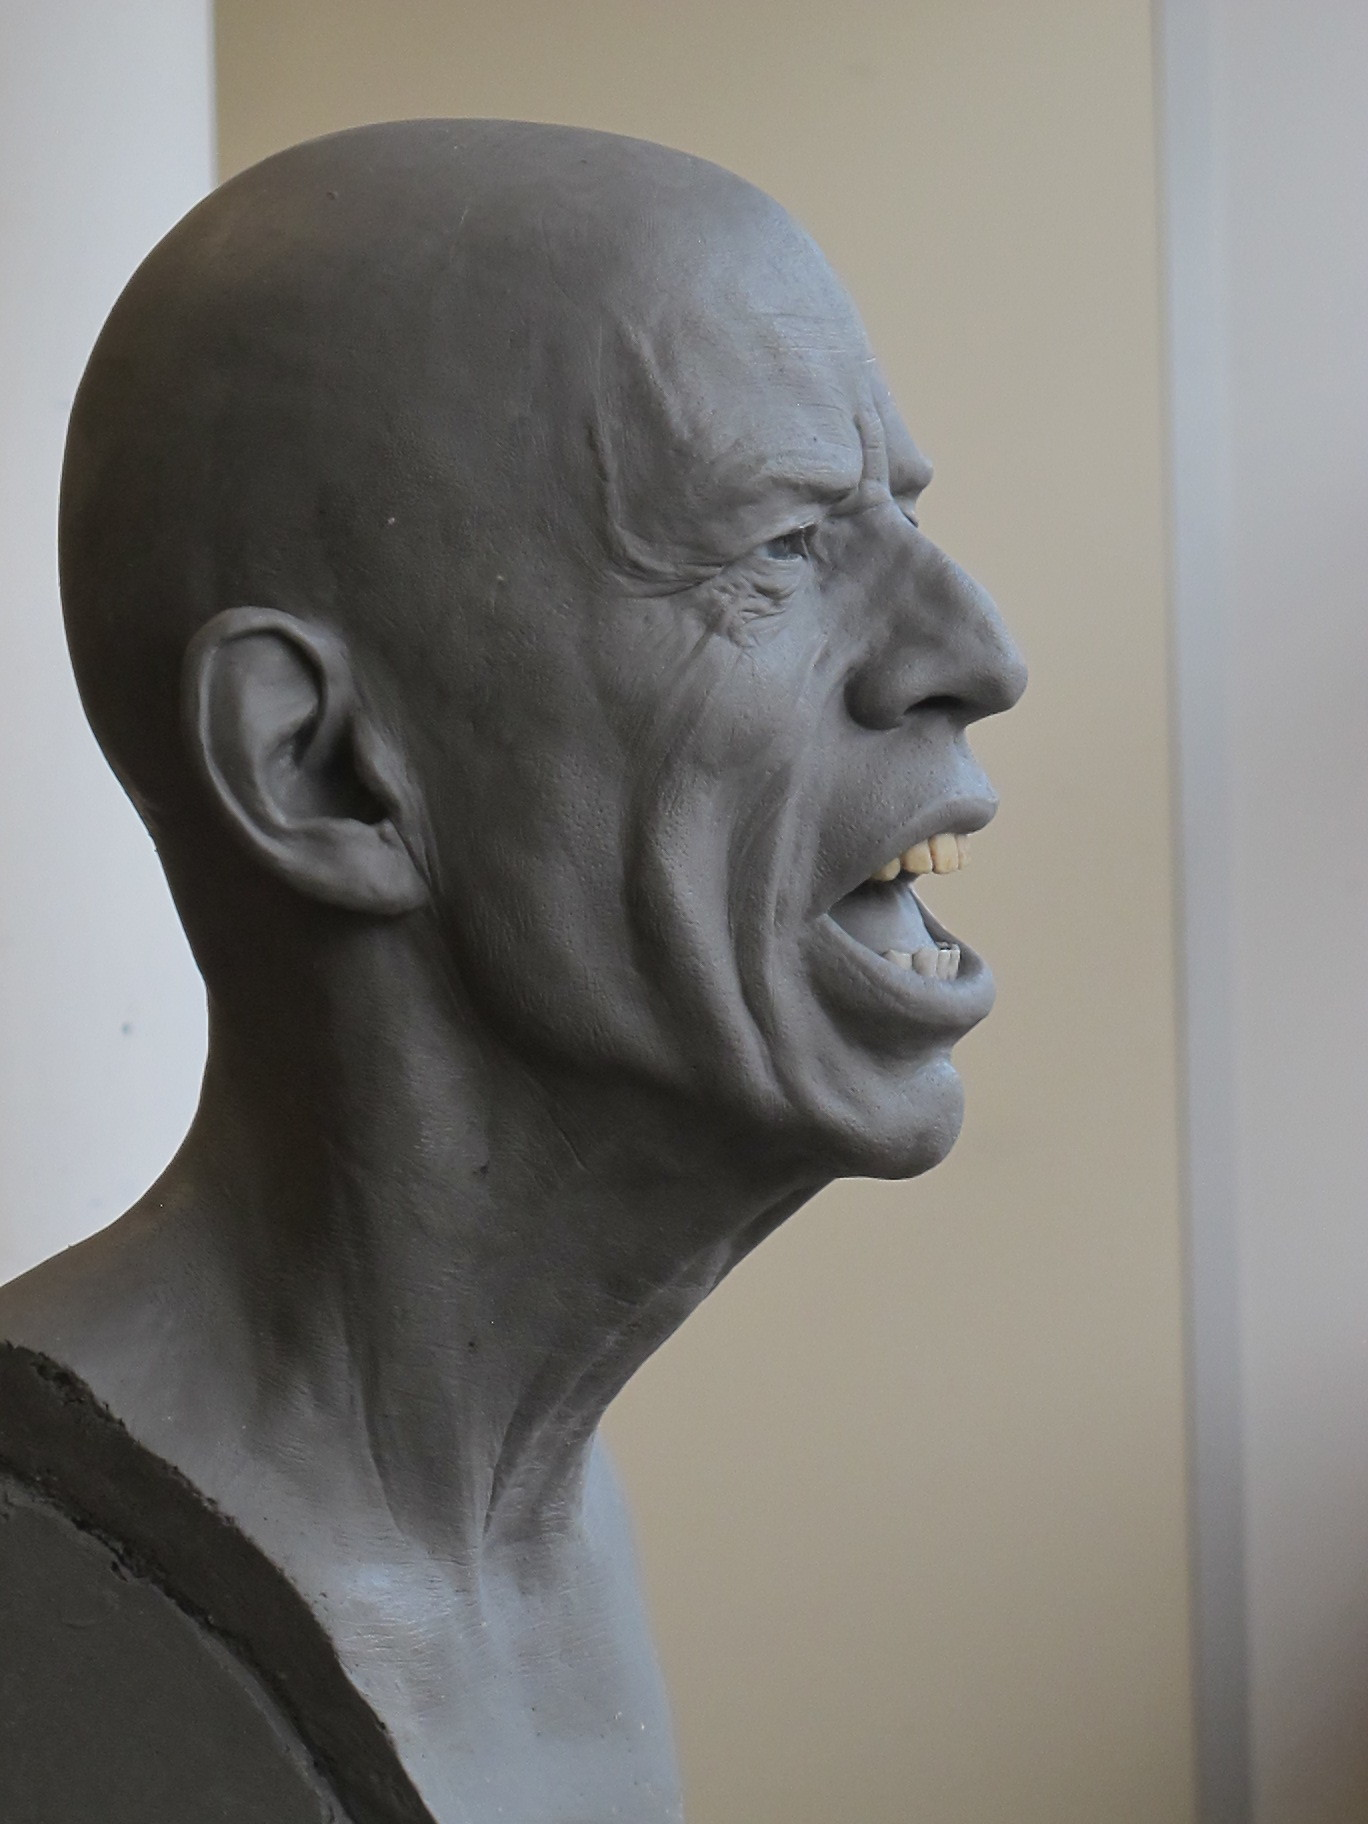 Mick Jagger - Sculpture en terre par Eric Saint Chaffray - Credit Musée Grévin